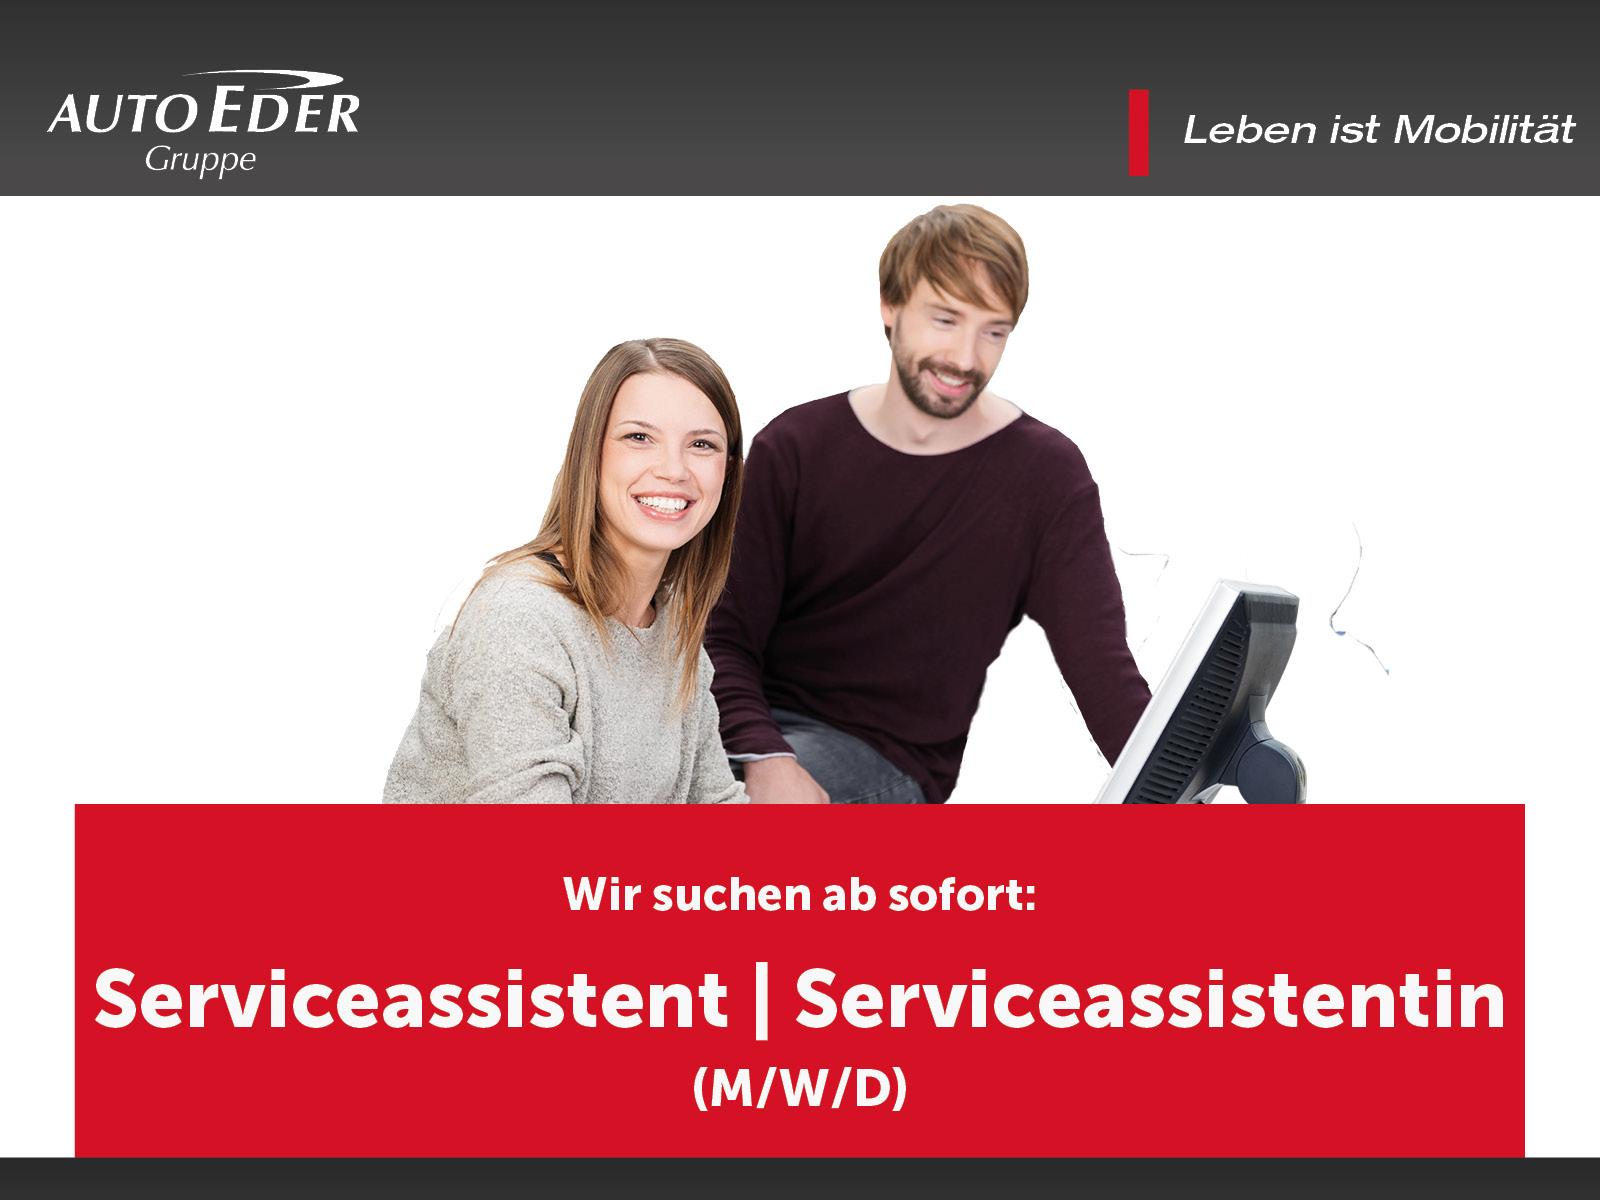 Serviceassistent | Serviceassistentin (m/w/d)